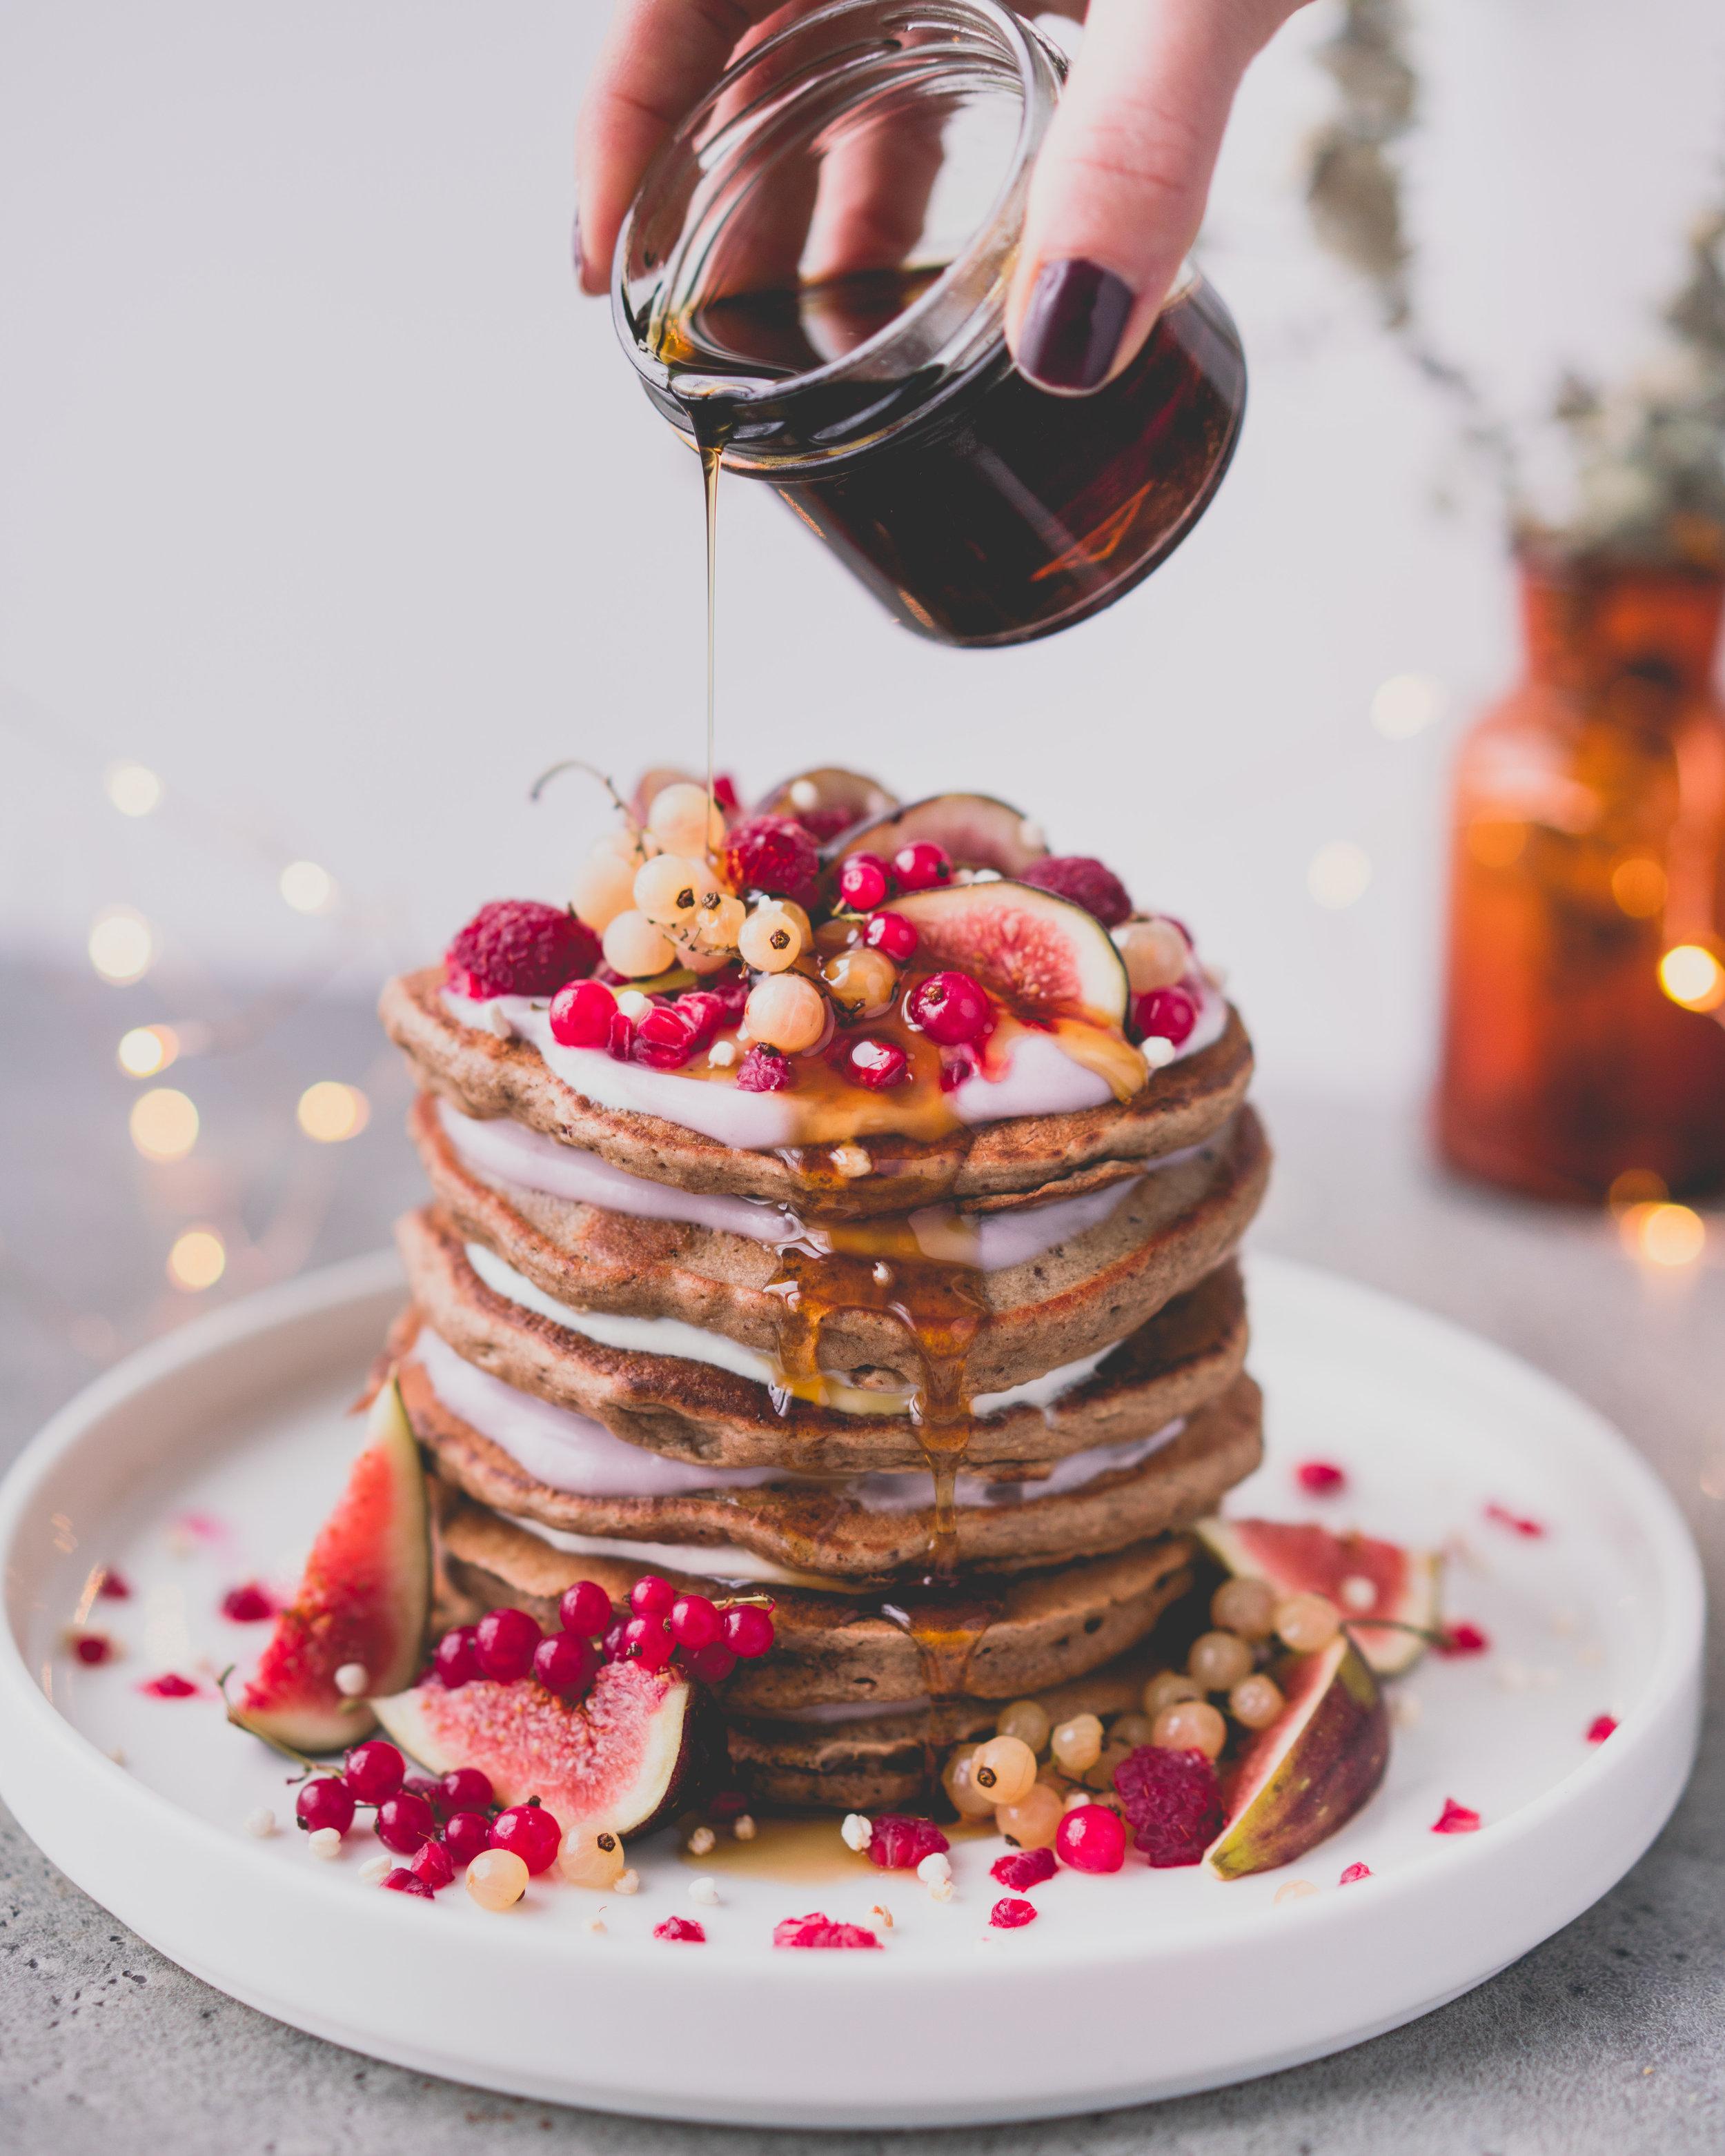 Pancakes véganes - donne 6-8 pancakes